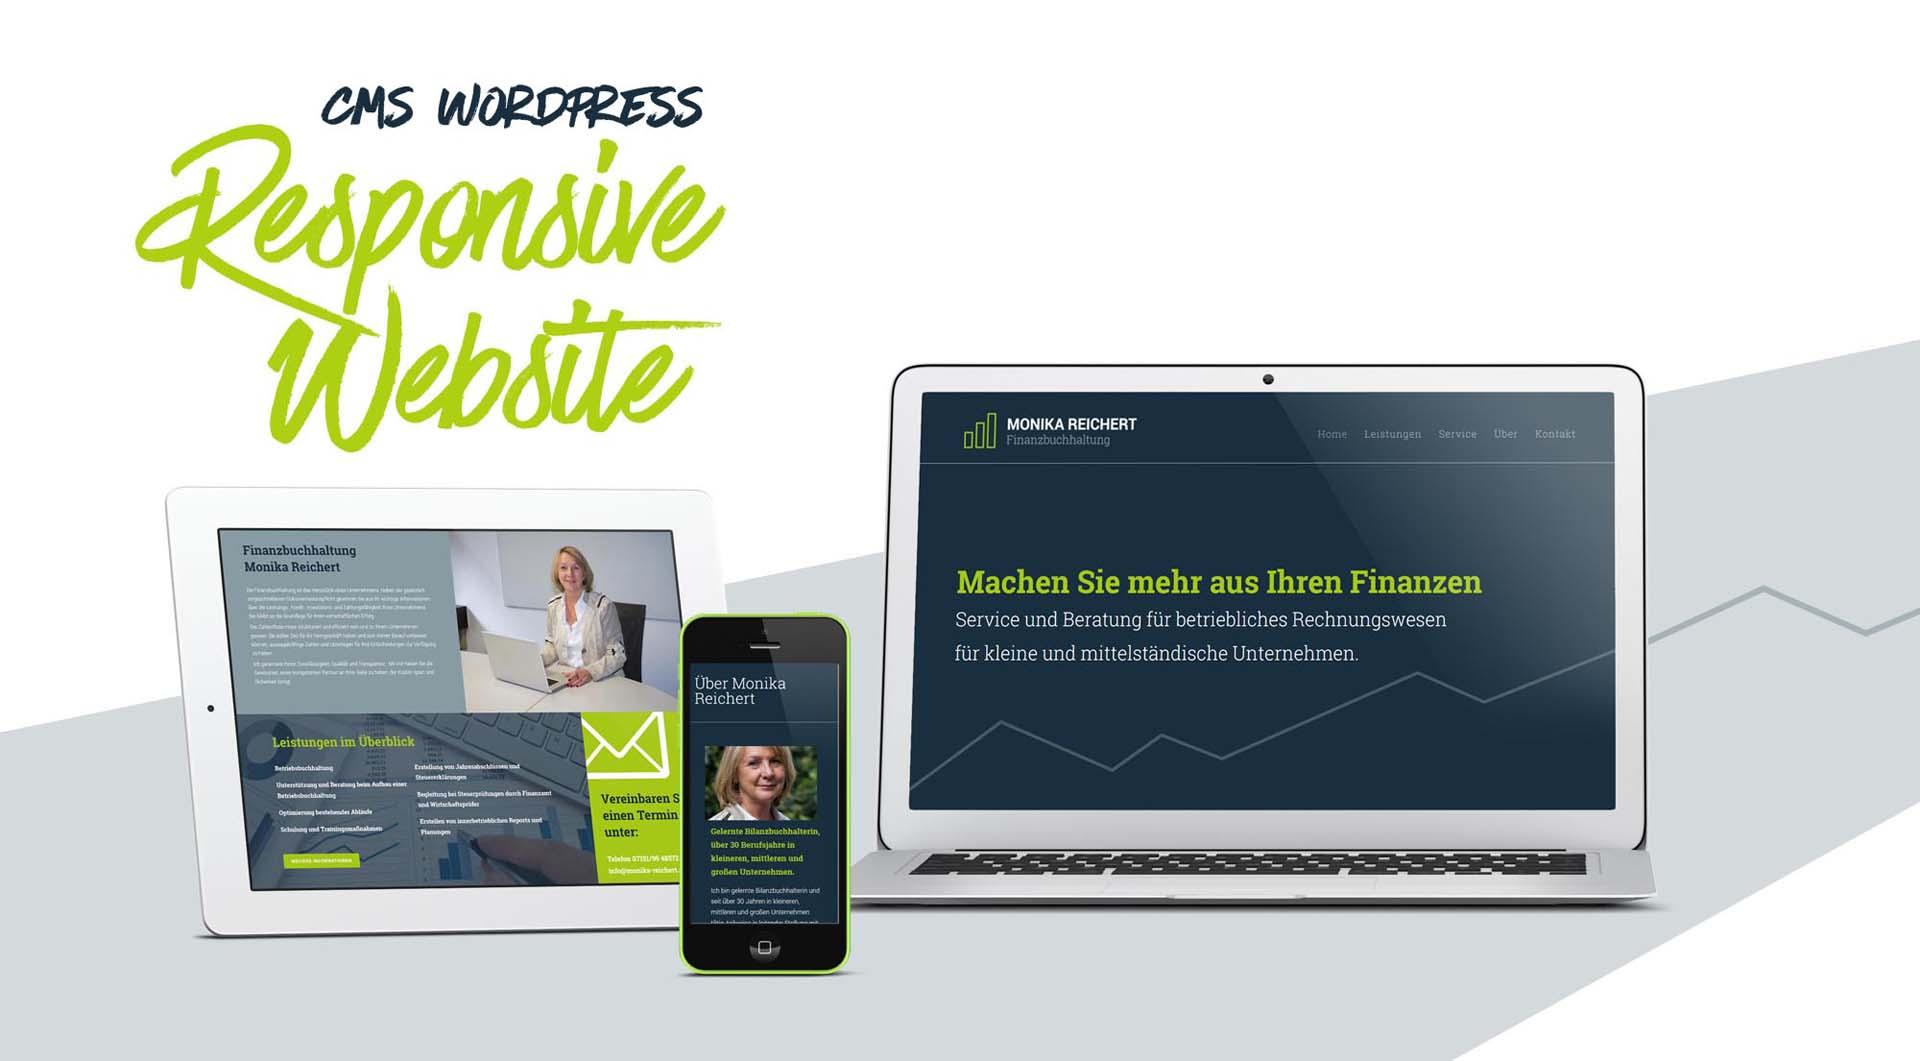 Monika Reichert_Website_CMS WordPress